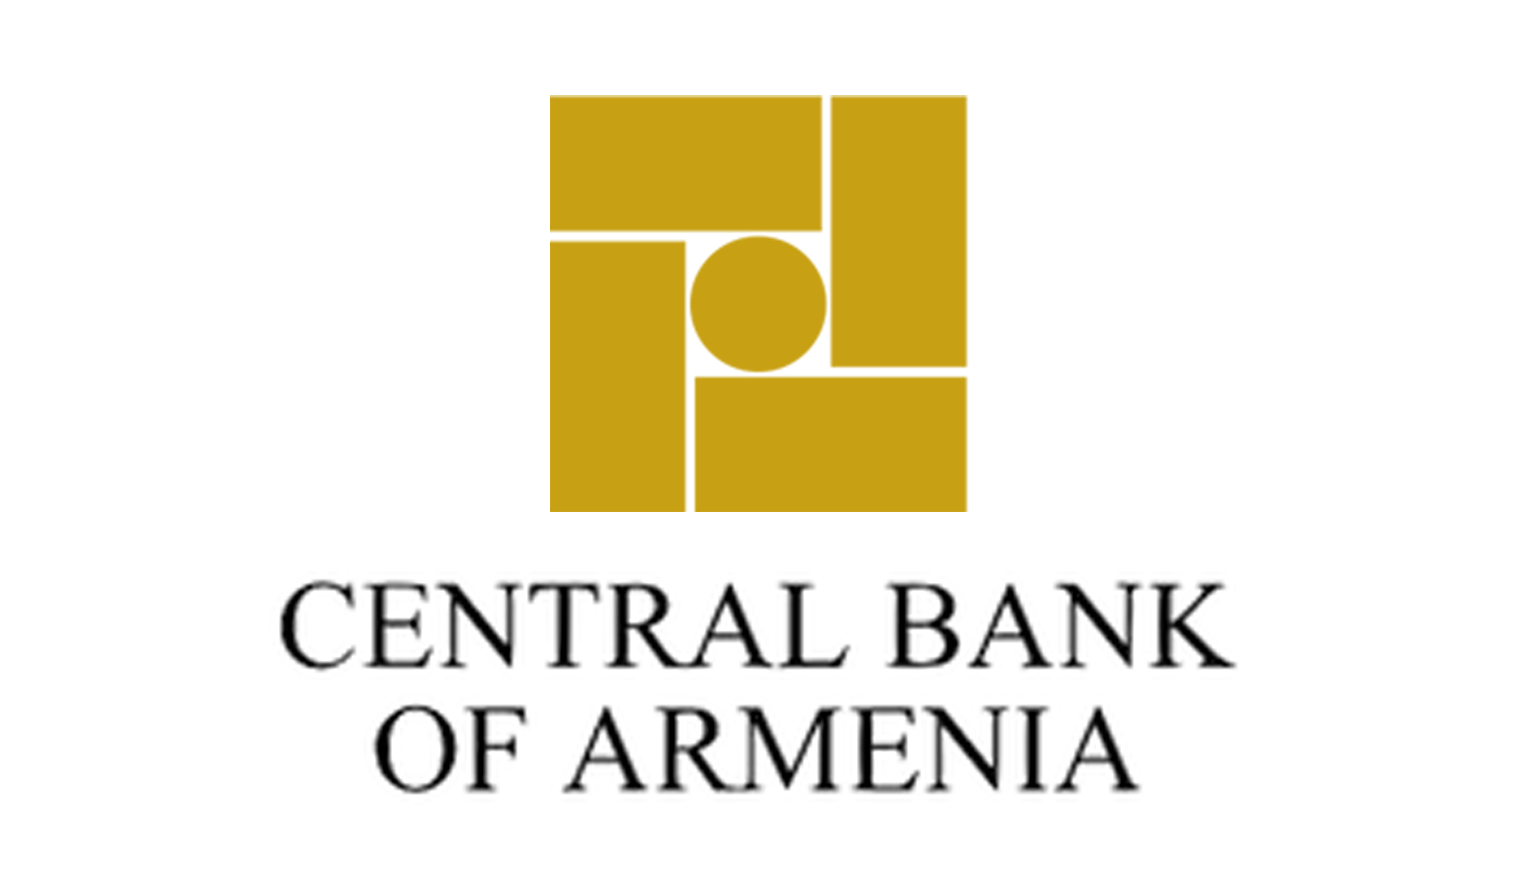 Central Bank of Armenia